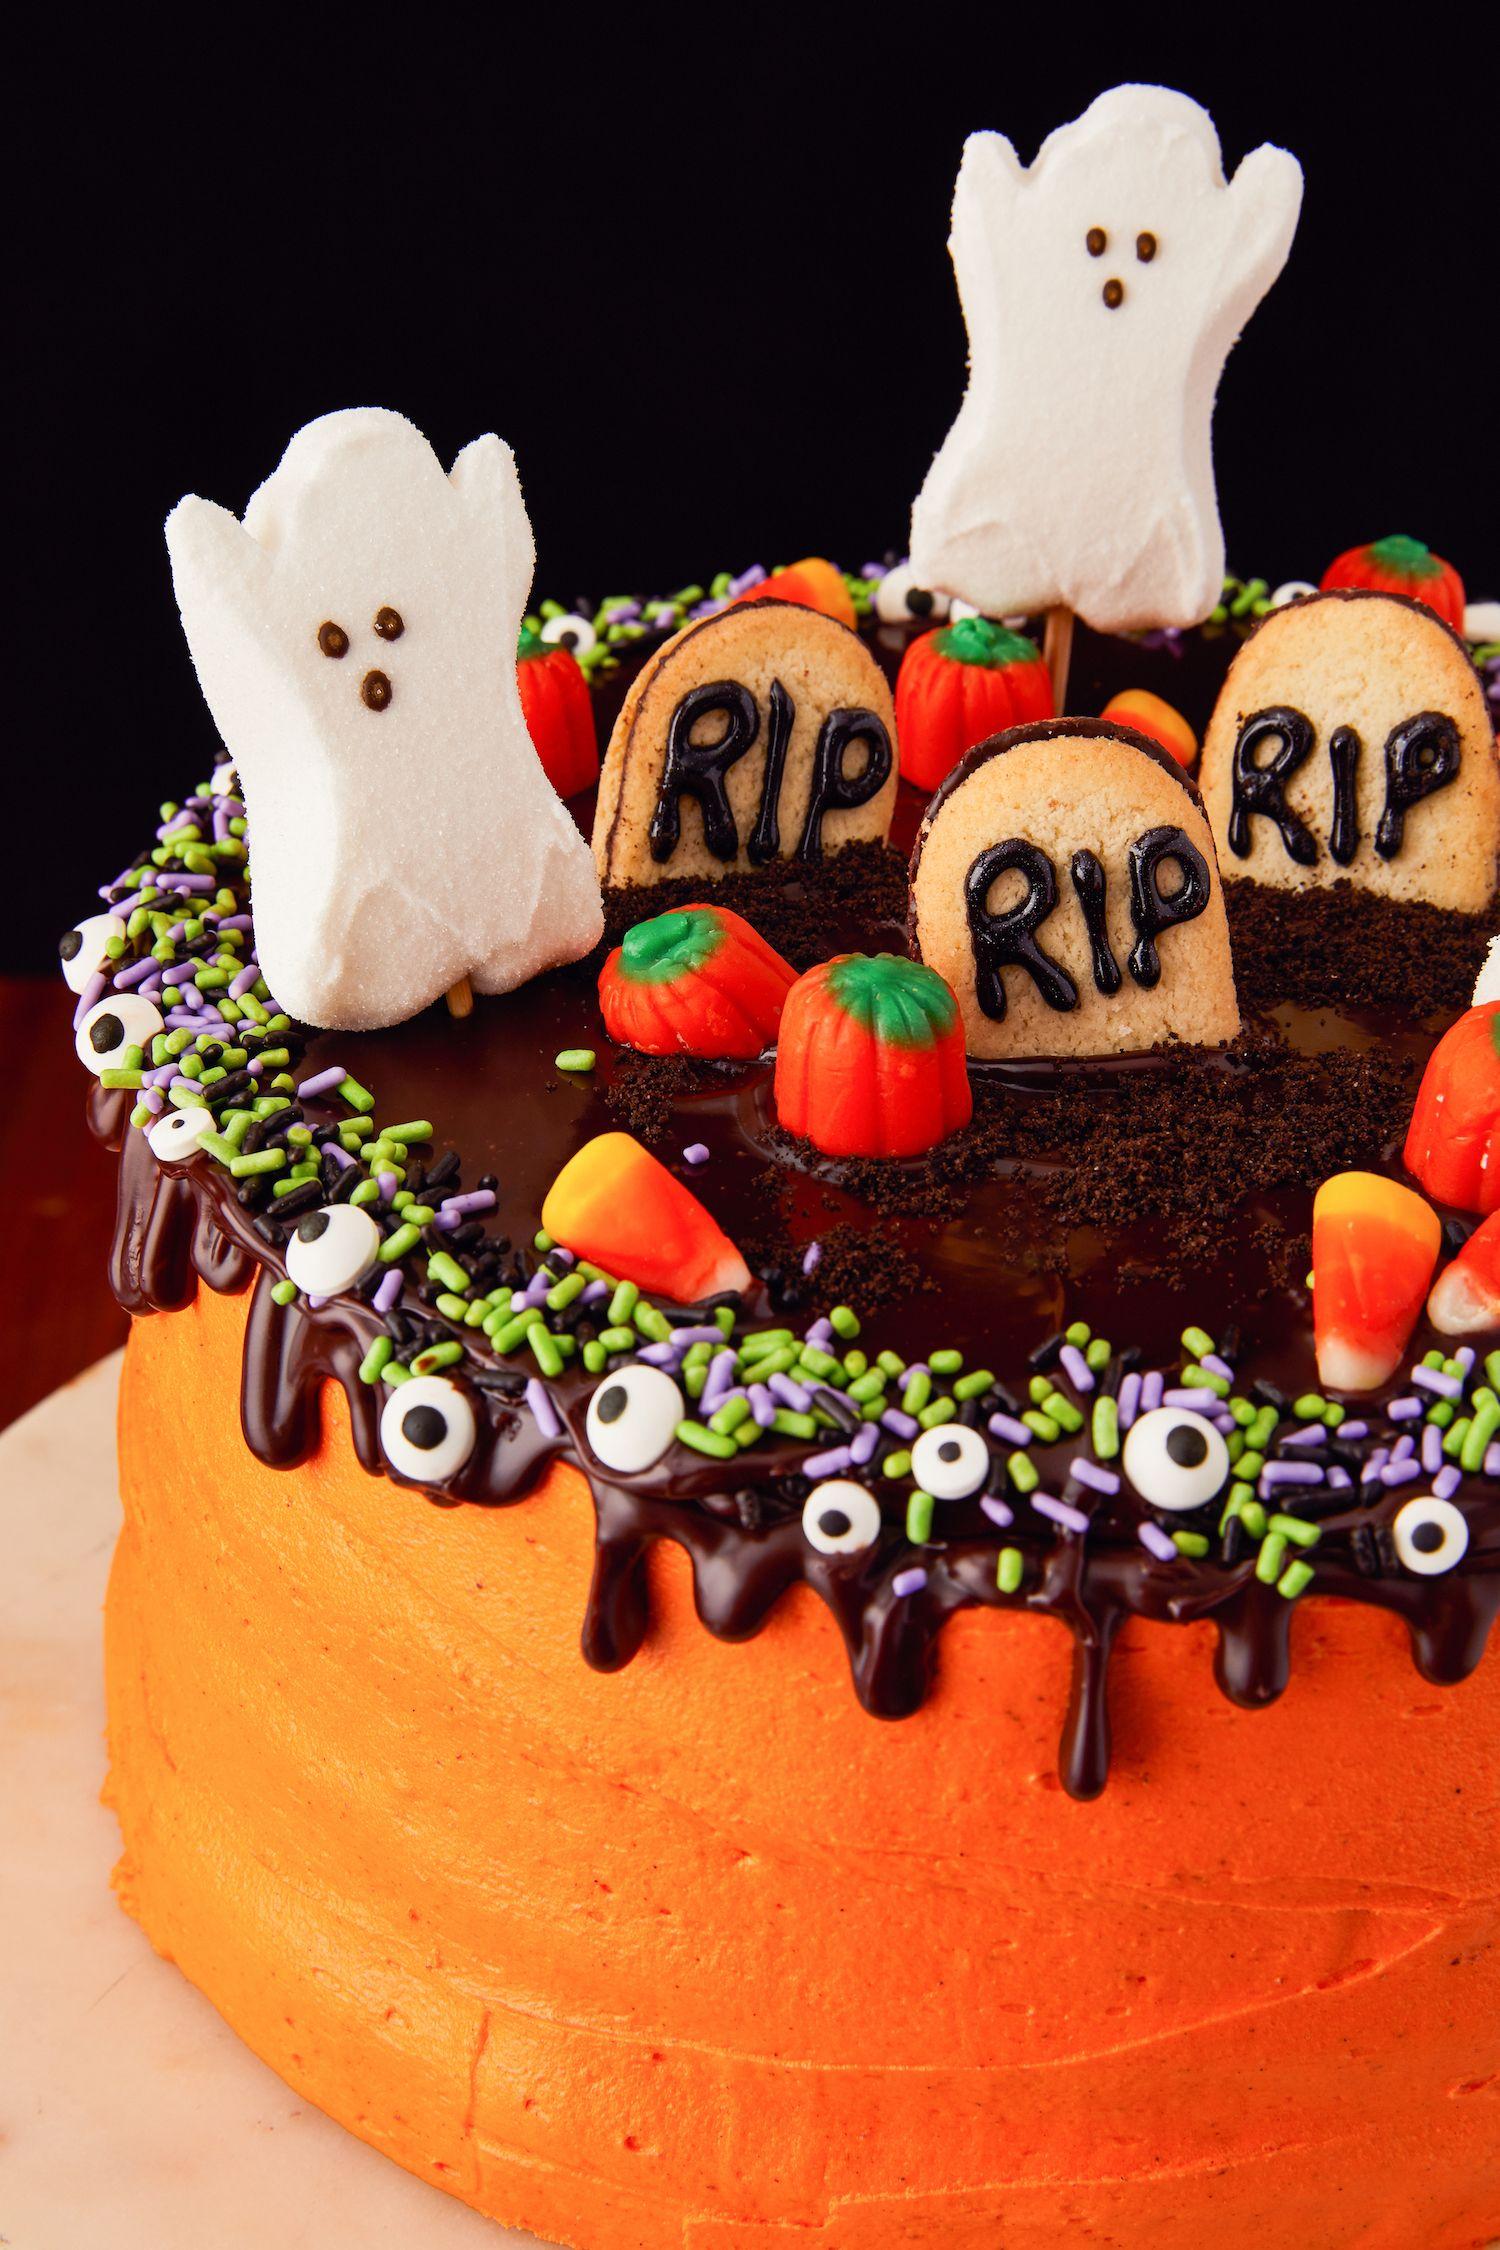 Best Halloween Party Desserts.50 Easy Halloween Party Treat Ideas Best Recipes For Halloween Treats